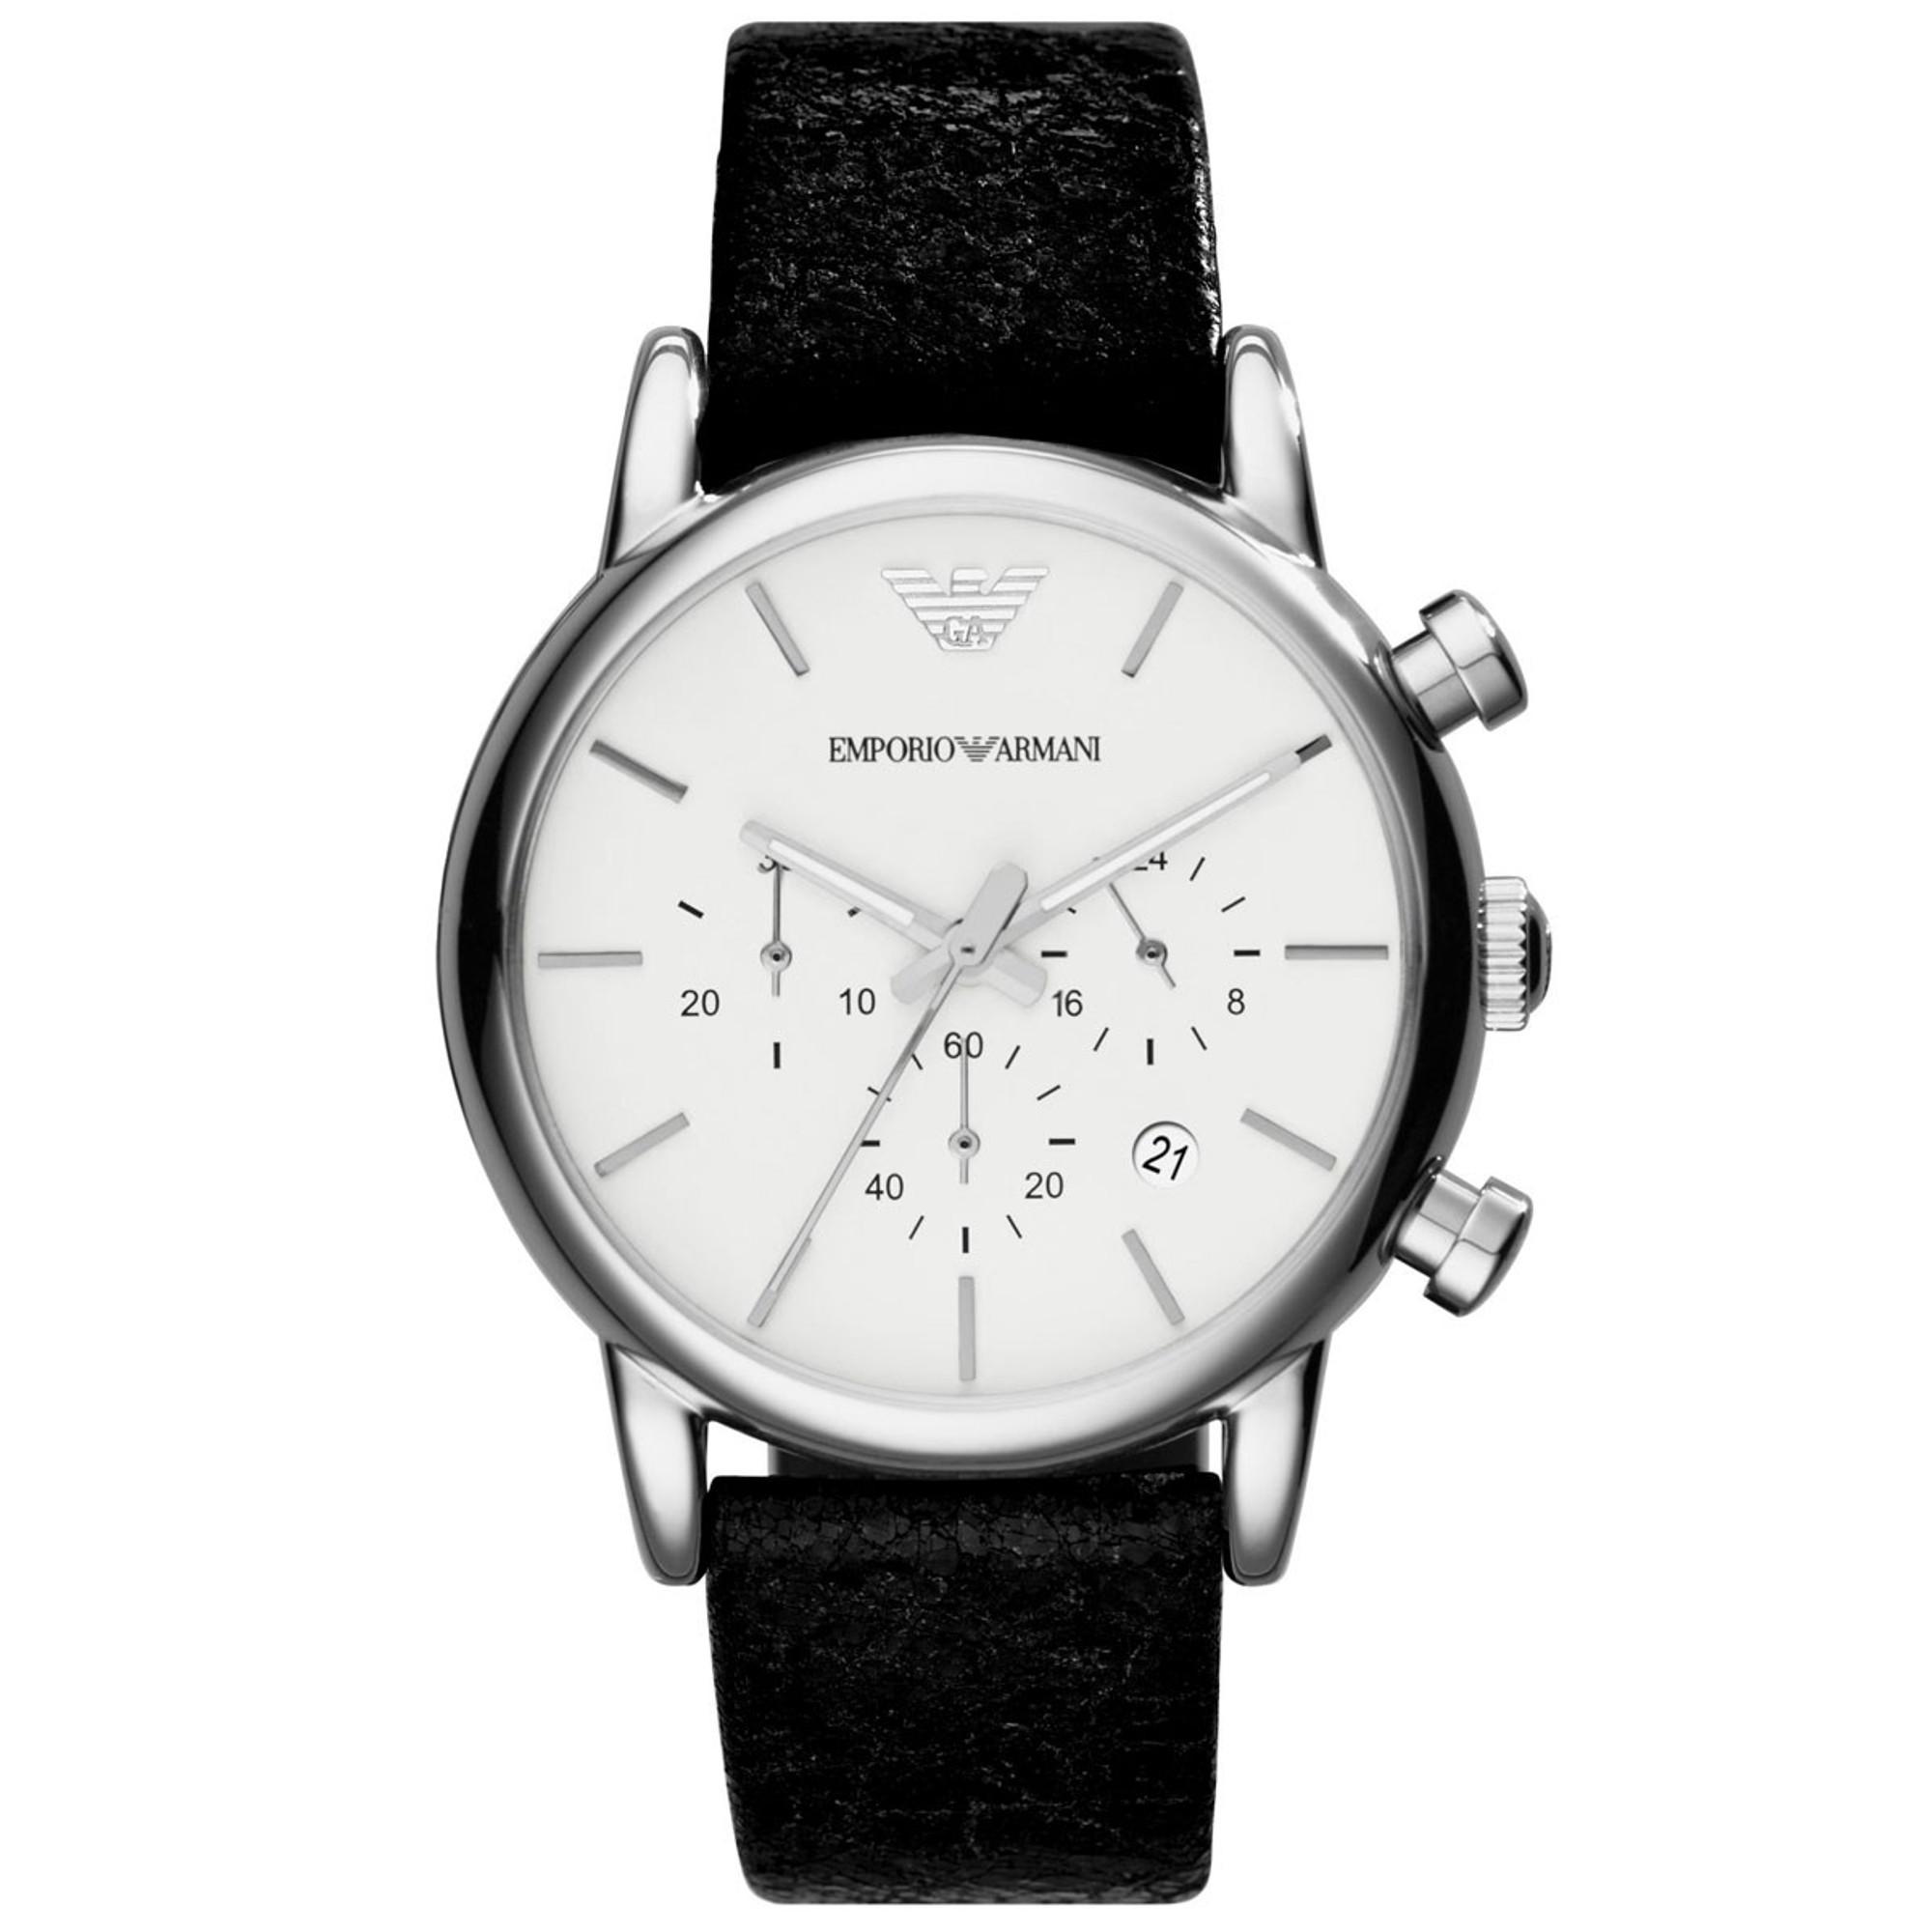 EMPORIO ARMANI Classic Watch Chronograph AR1810